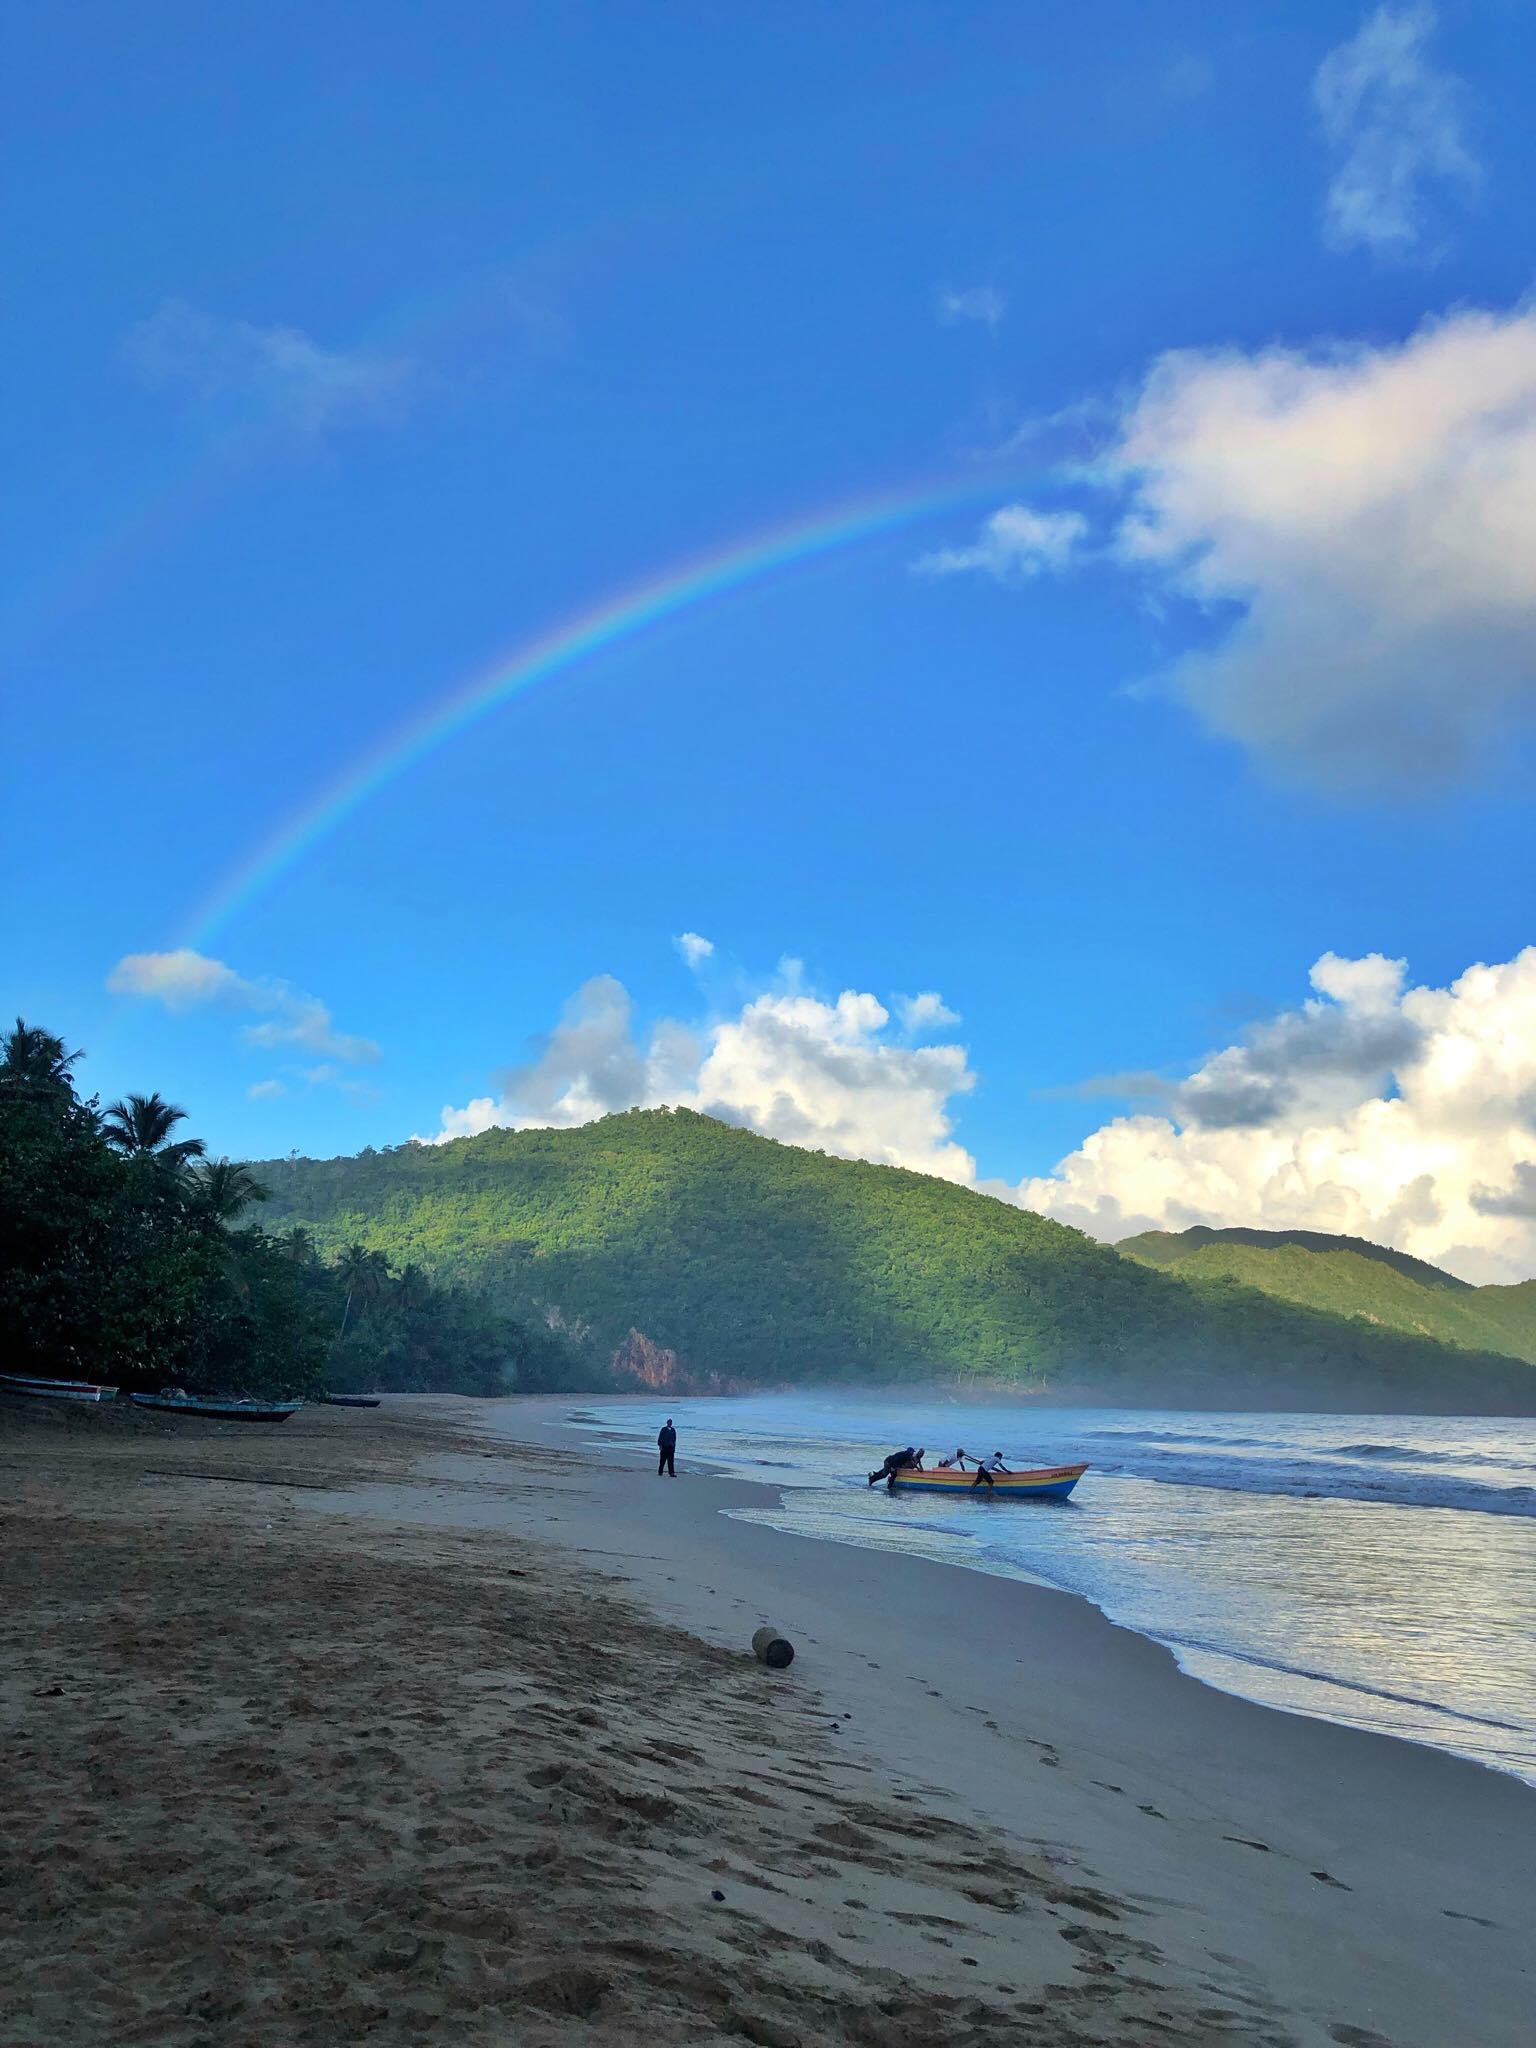 Liveaboard Life Day 260: My dream destination in the Dominican Republic 😍